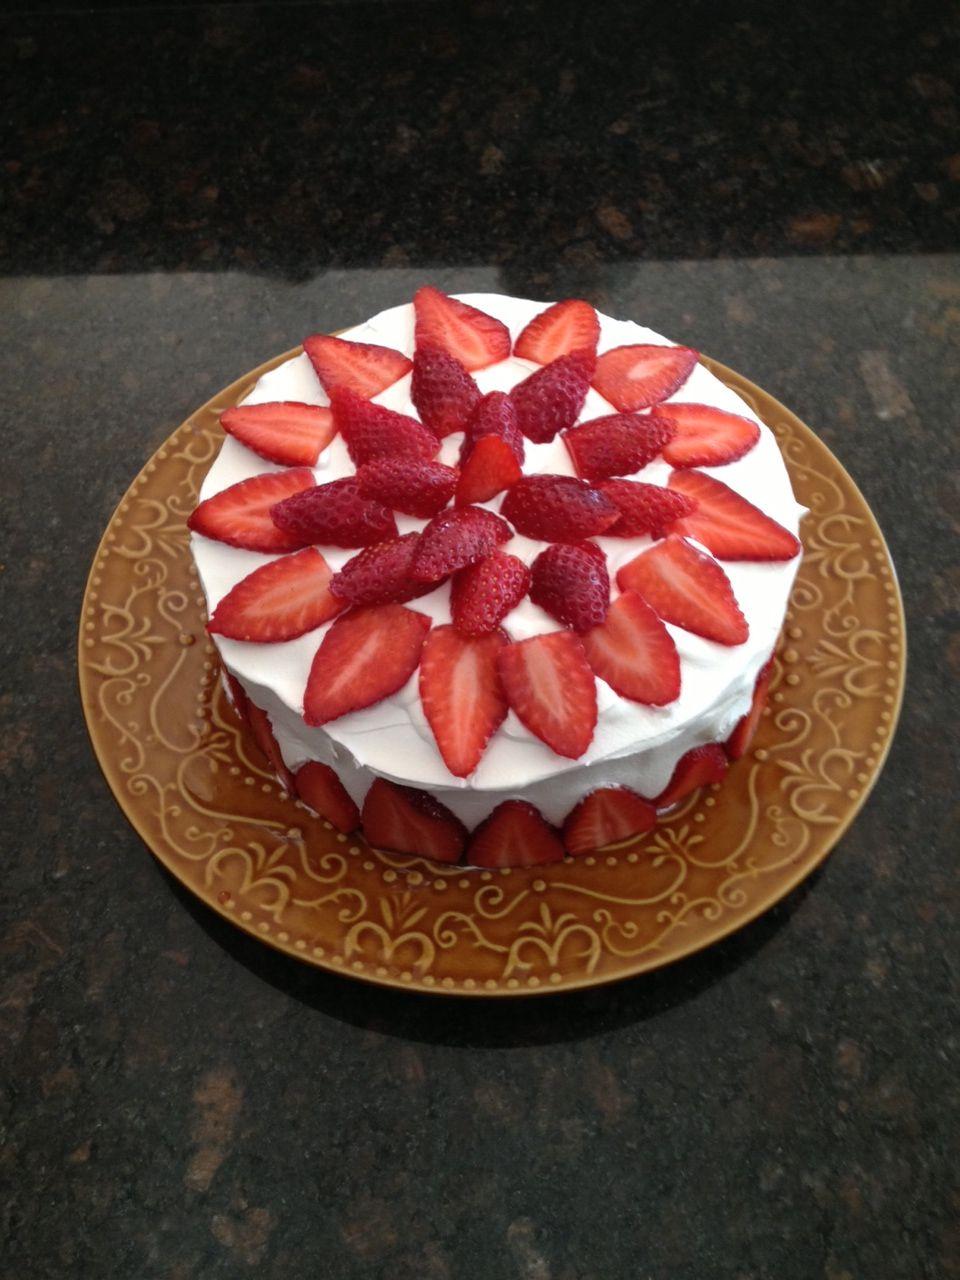 toms angel food cake with strawberry preservesvanilla